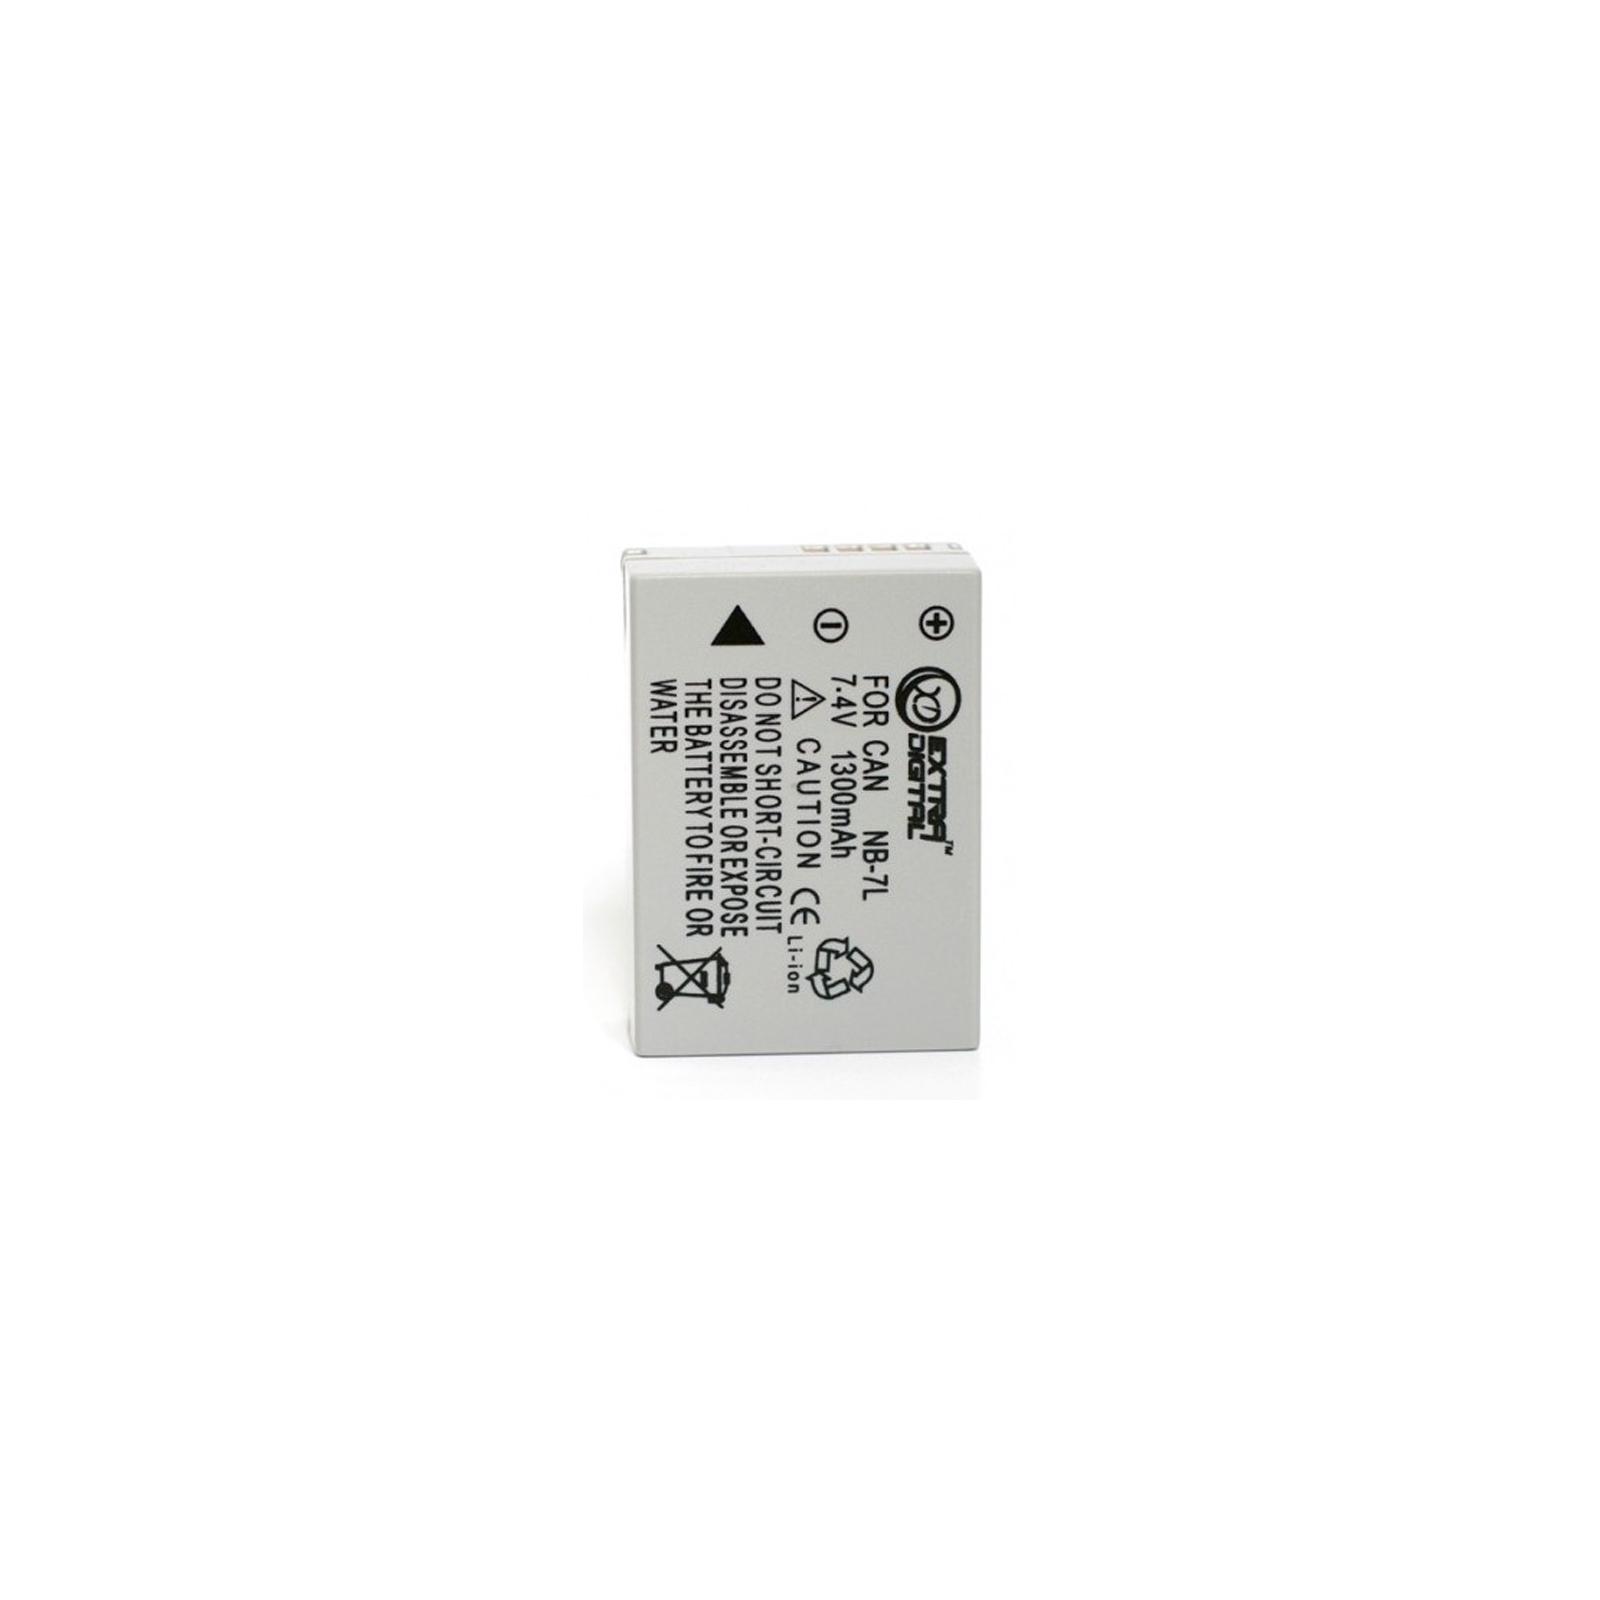 Аккумулятор к фото/видео EXTRADIGITAL Canon NB-7L (BDC2446)